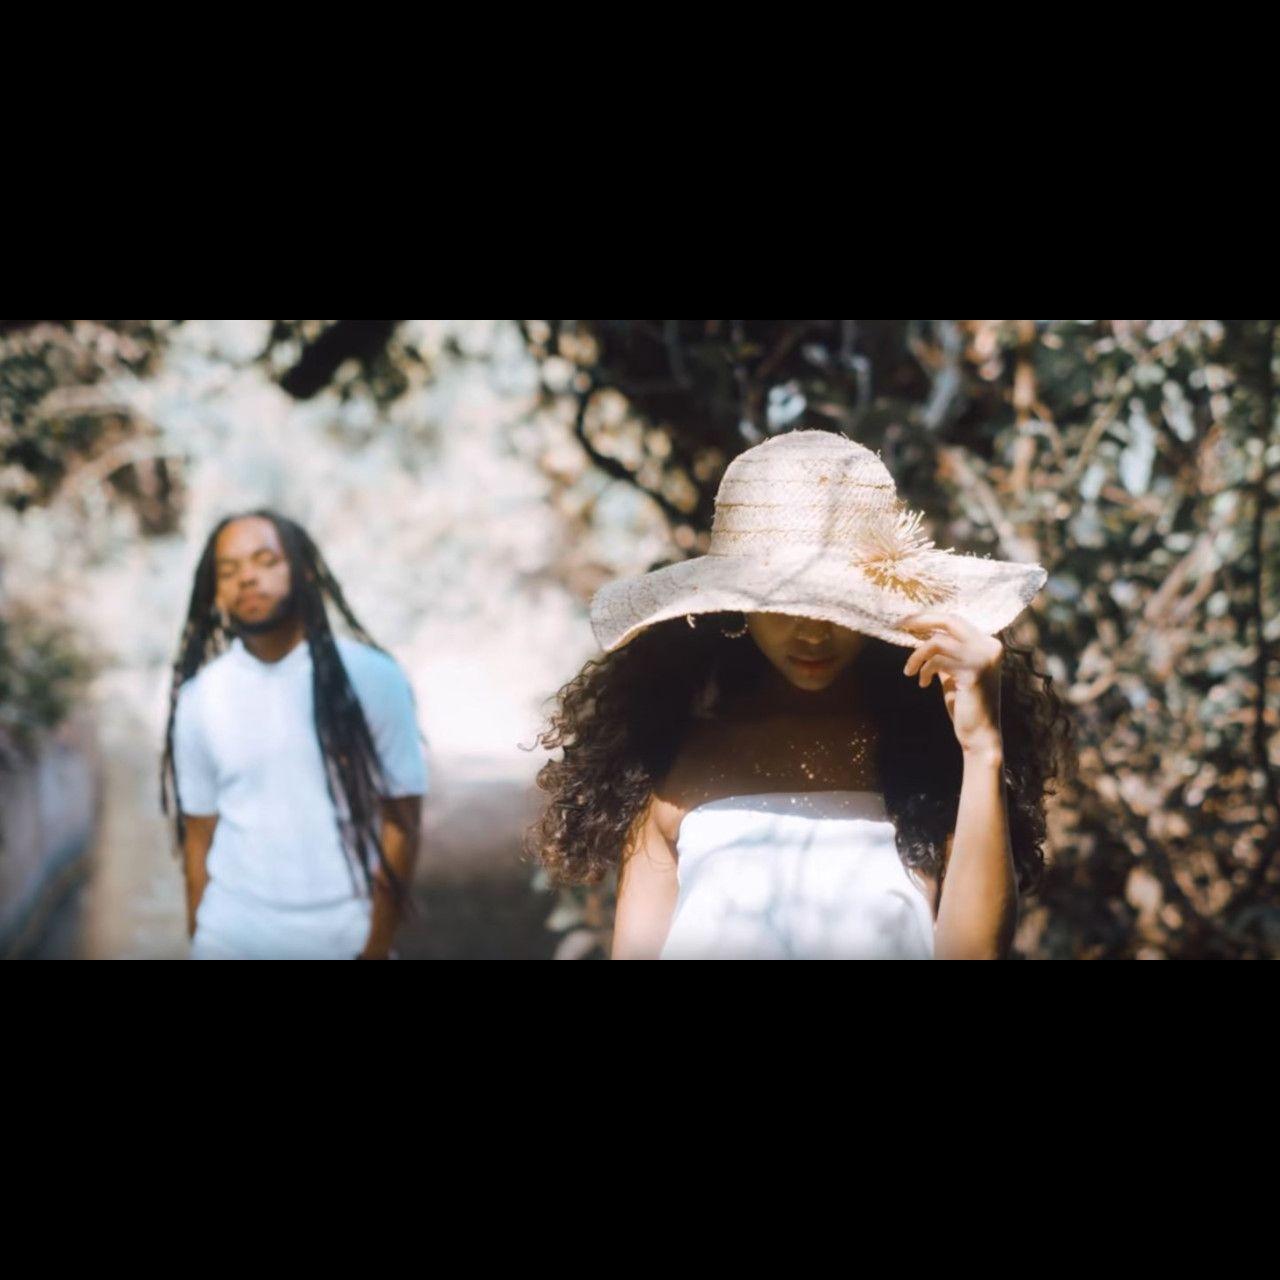 DJ Mimi - Paradise (ft. Marshall) (Thumbnail)